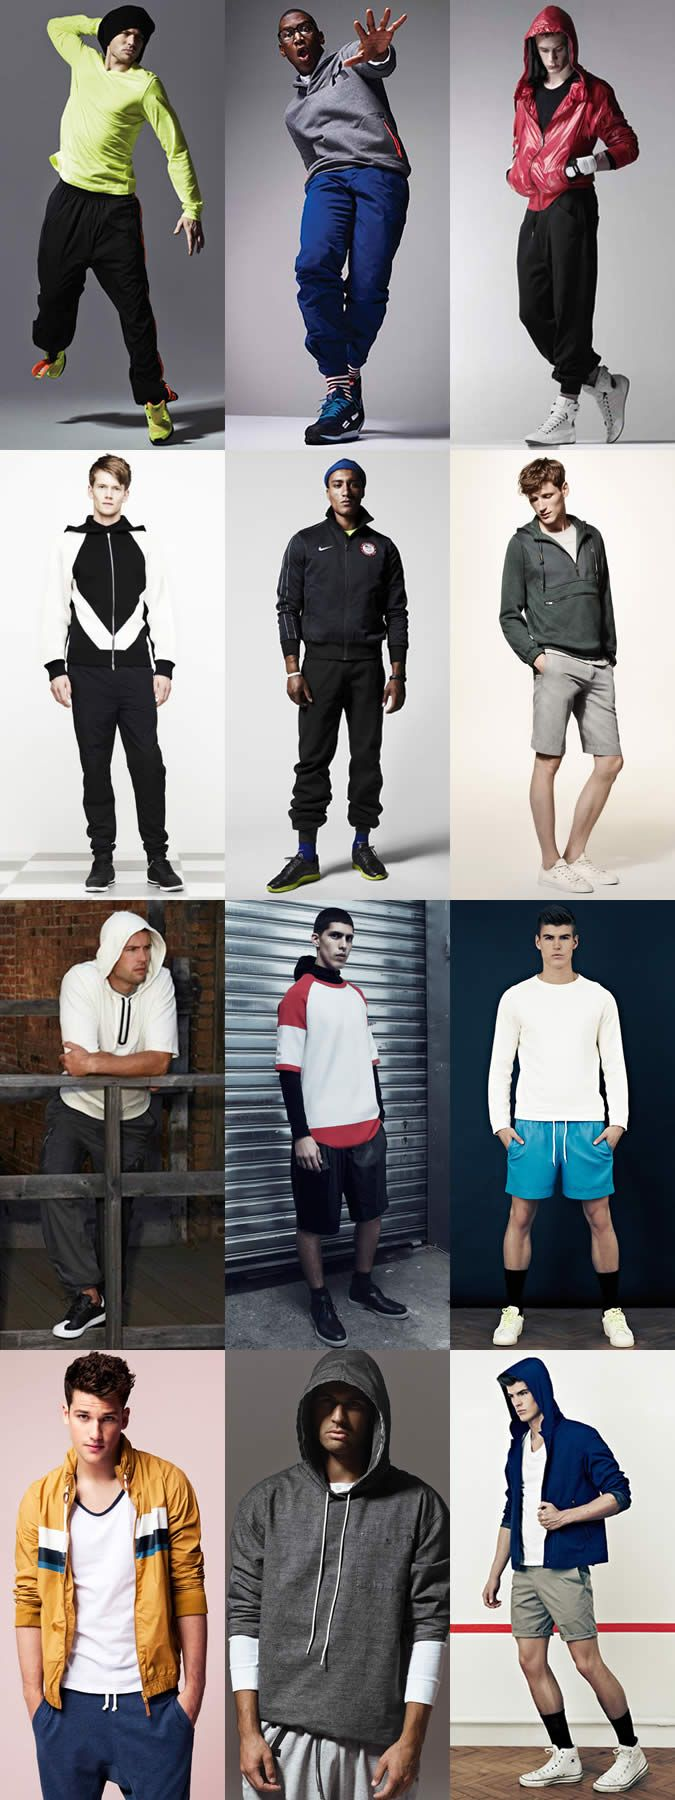 Fashion vs Function: Men's Running Wear